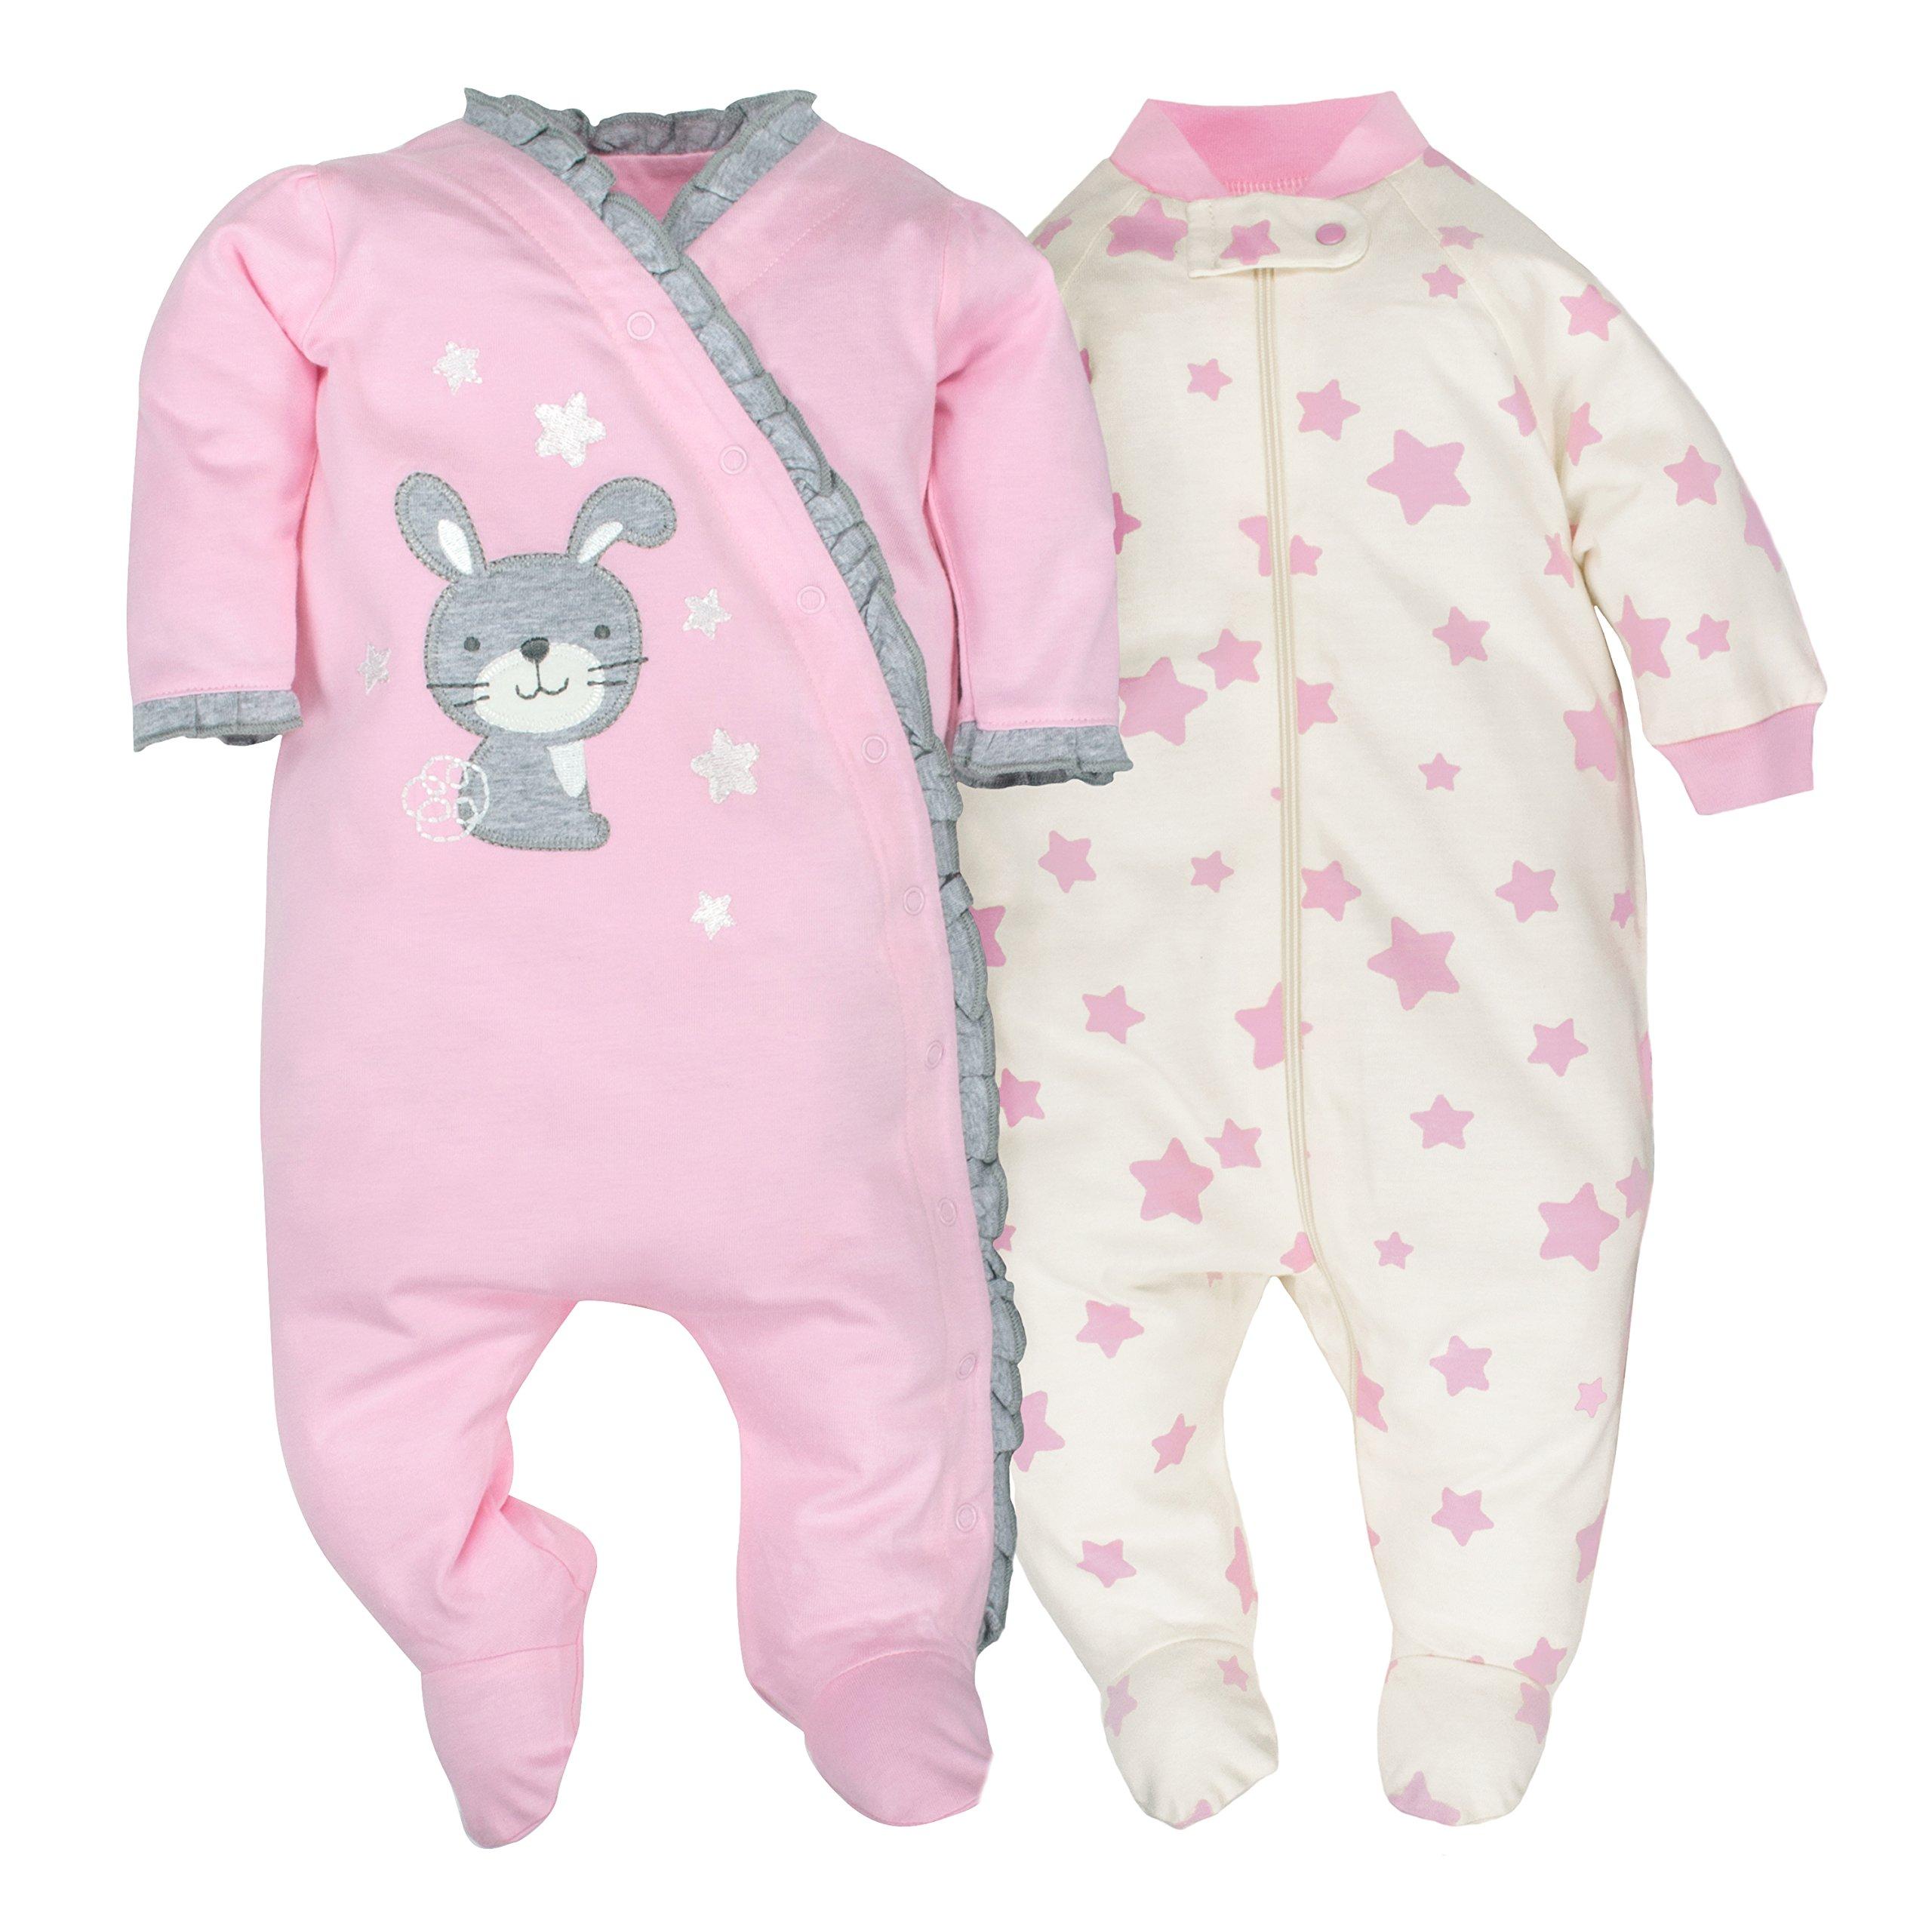 Gerber Baby Girls 2 Pack Organic Zip Front Sleep 'N Play, Light Pink/Ivory, 0-3 Months